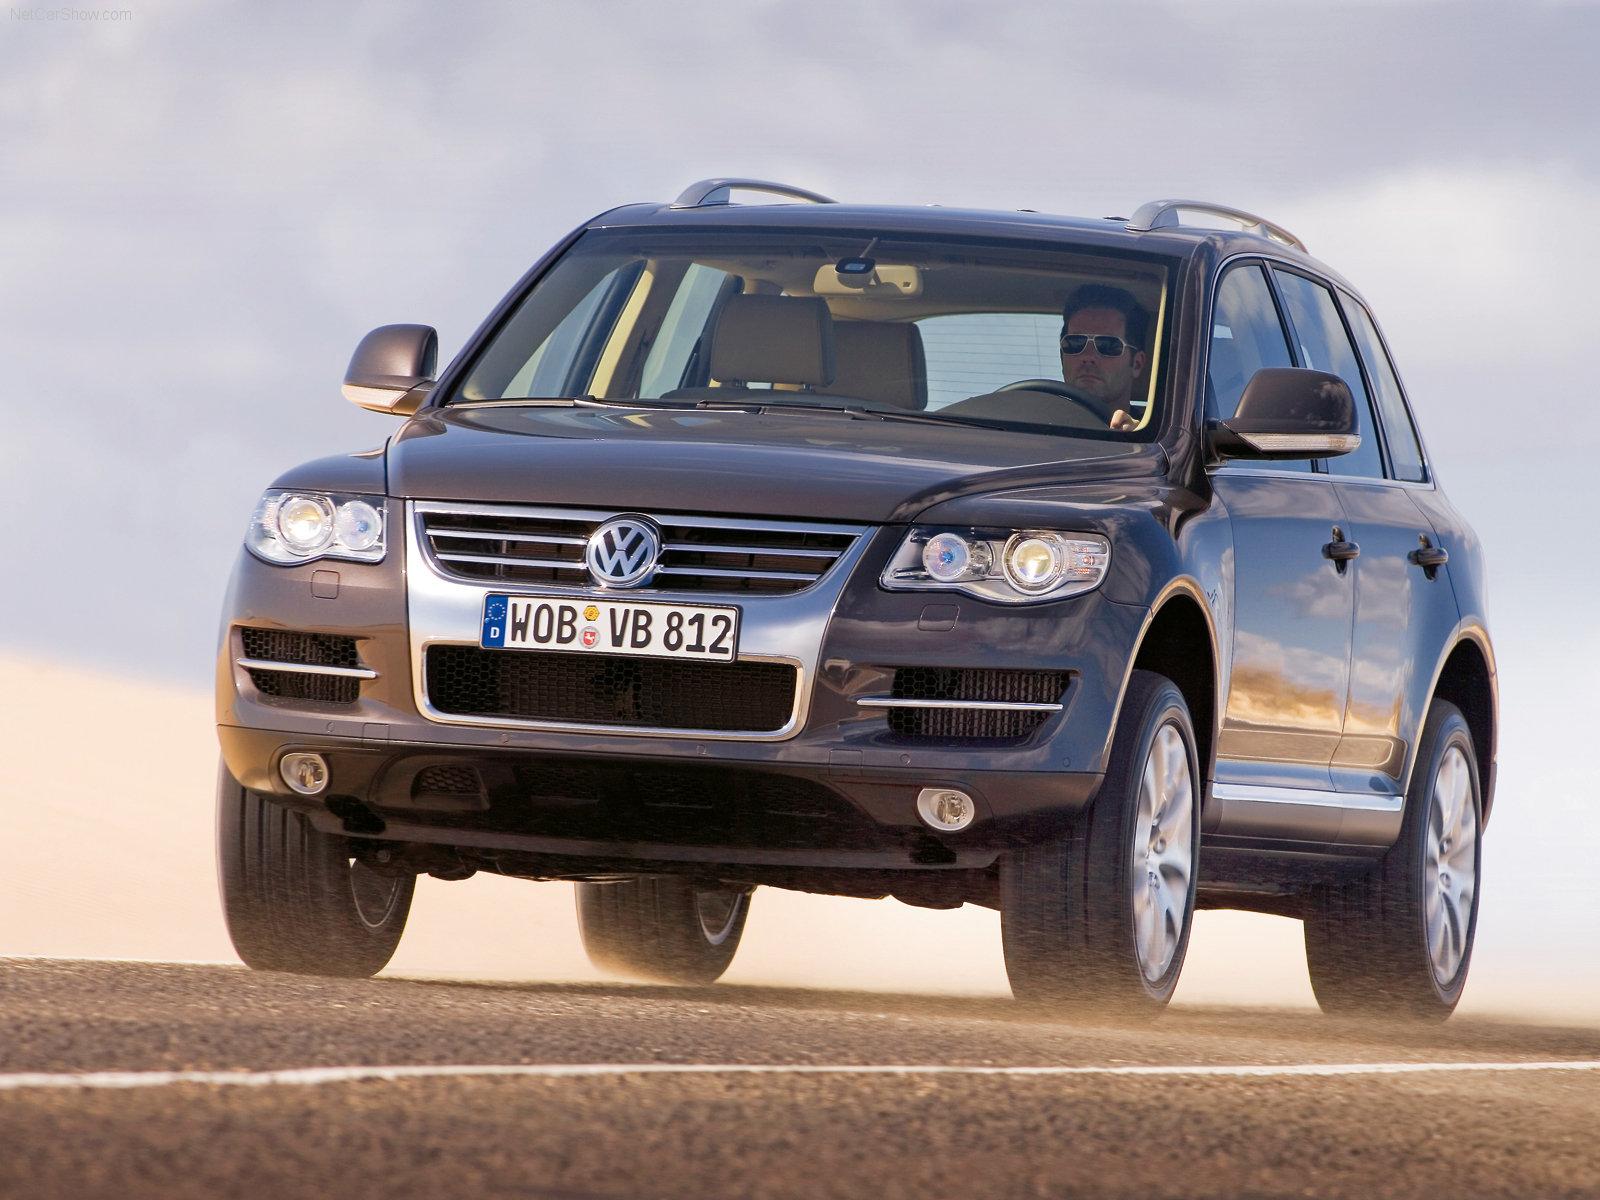 http://w04.ru/foto/Volkswagen-Touareg_2007_1600x1200_wallpaper_01.jpg